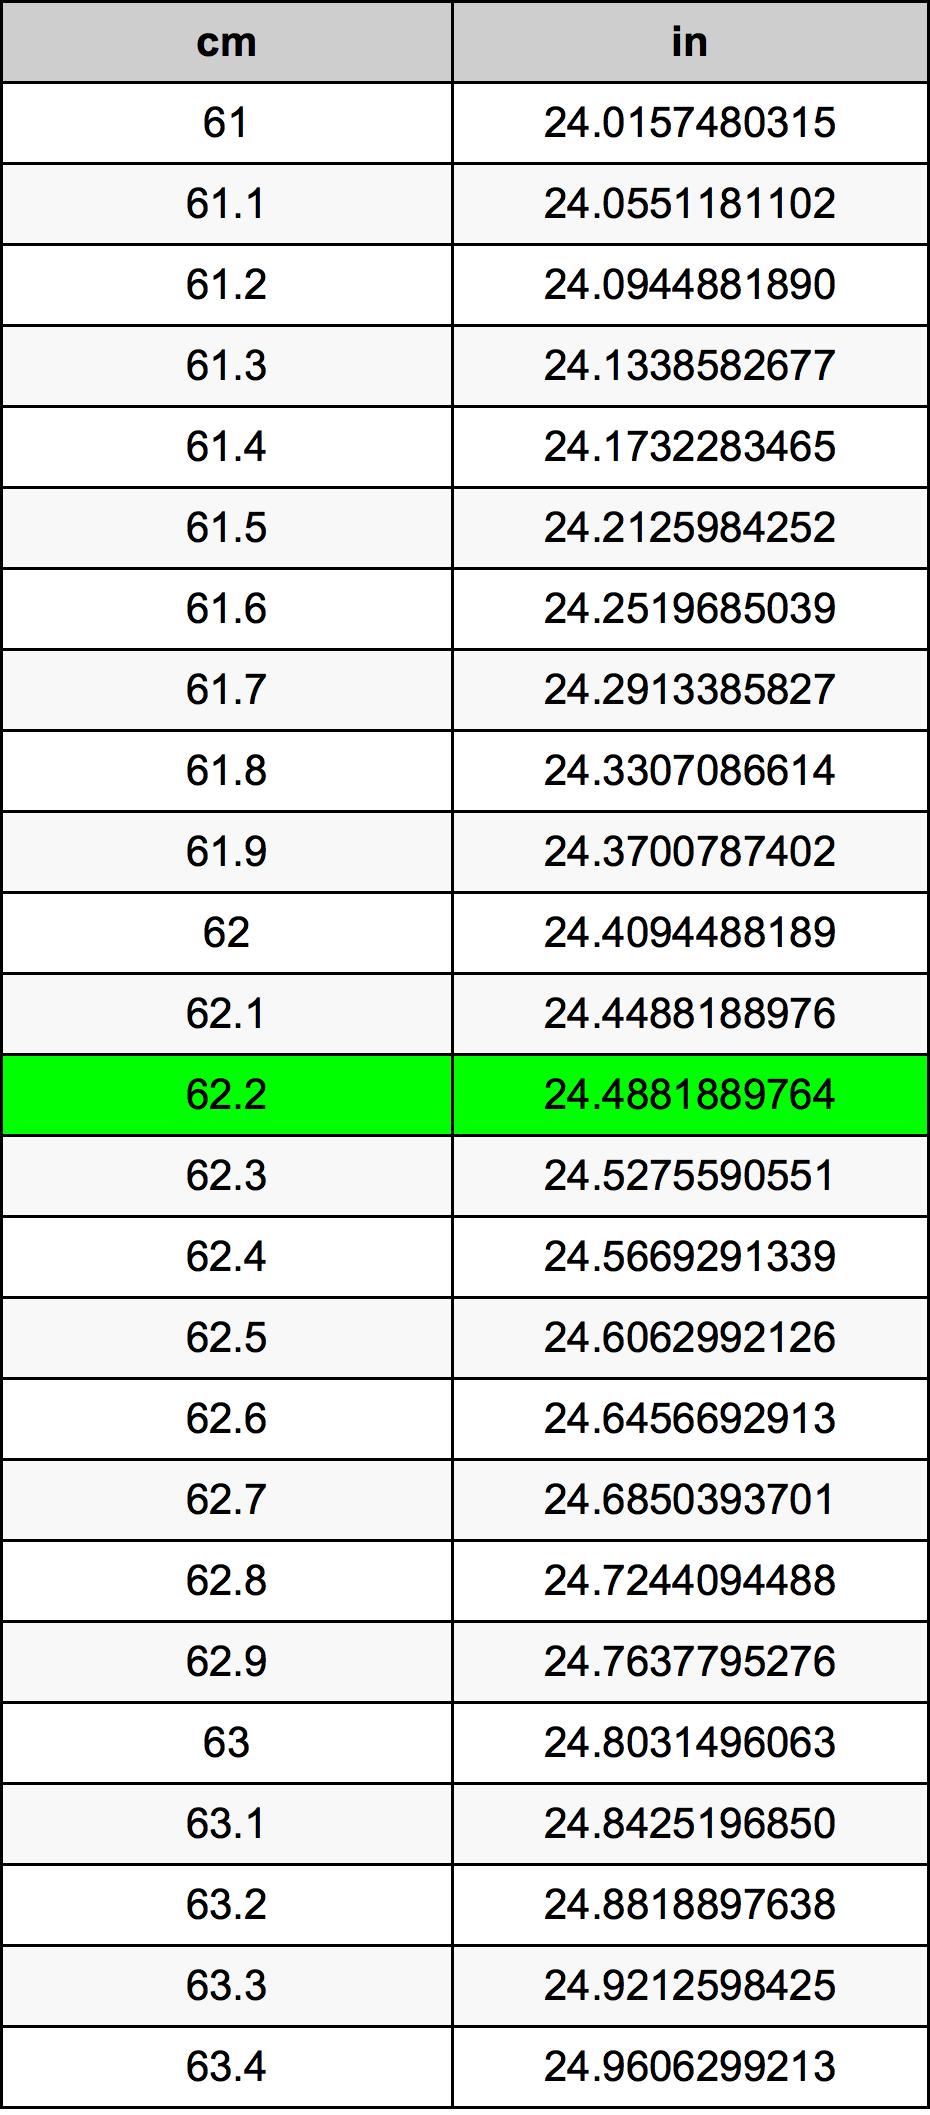 62.2 Centimeter konverteringstabellen